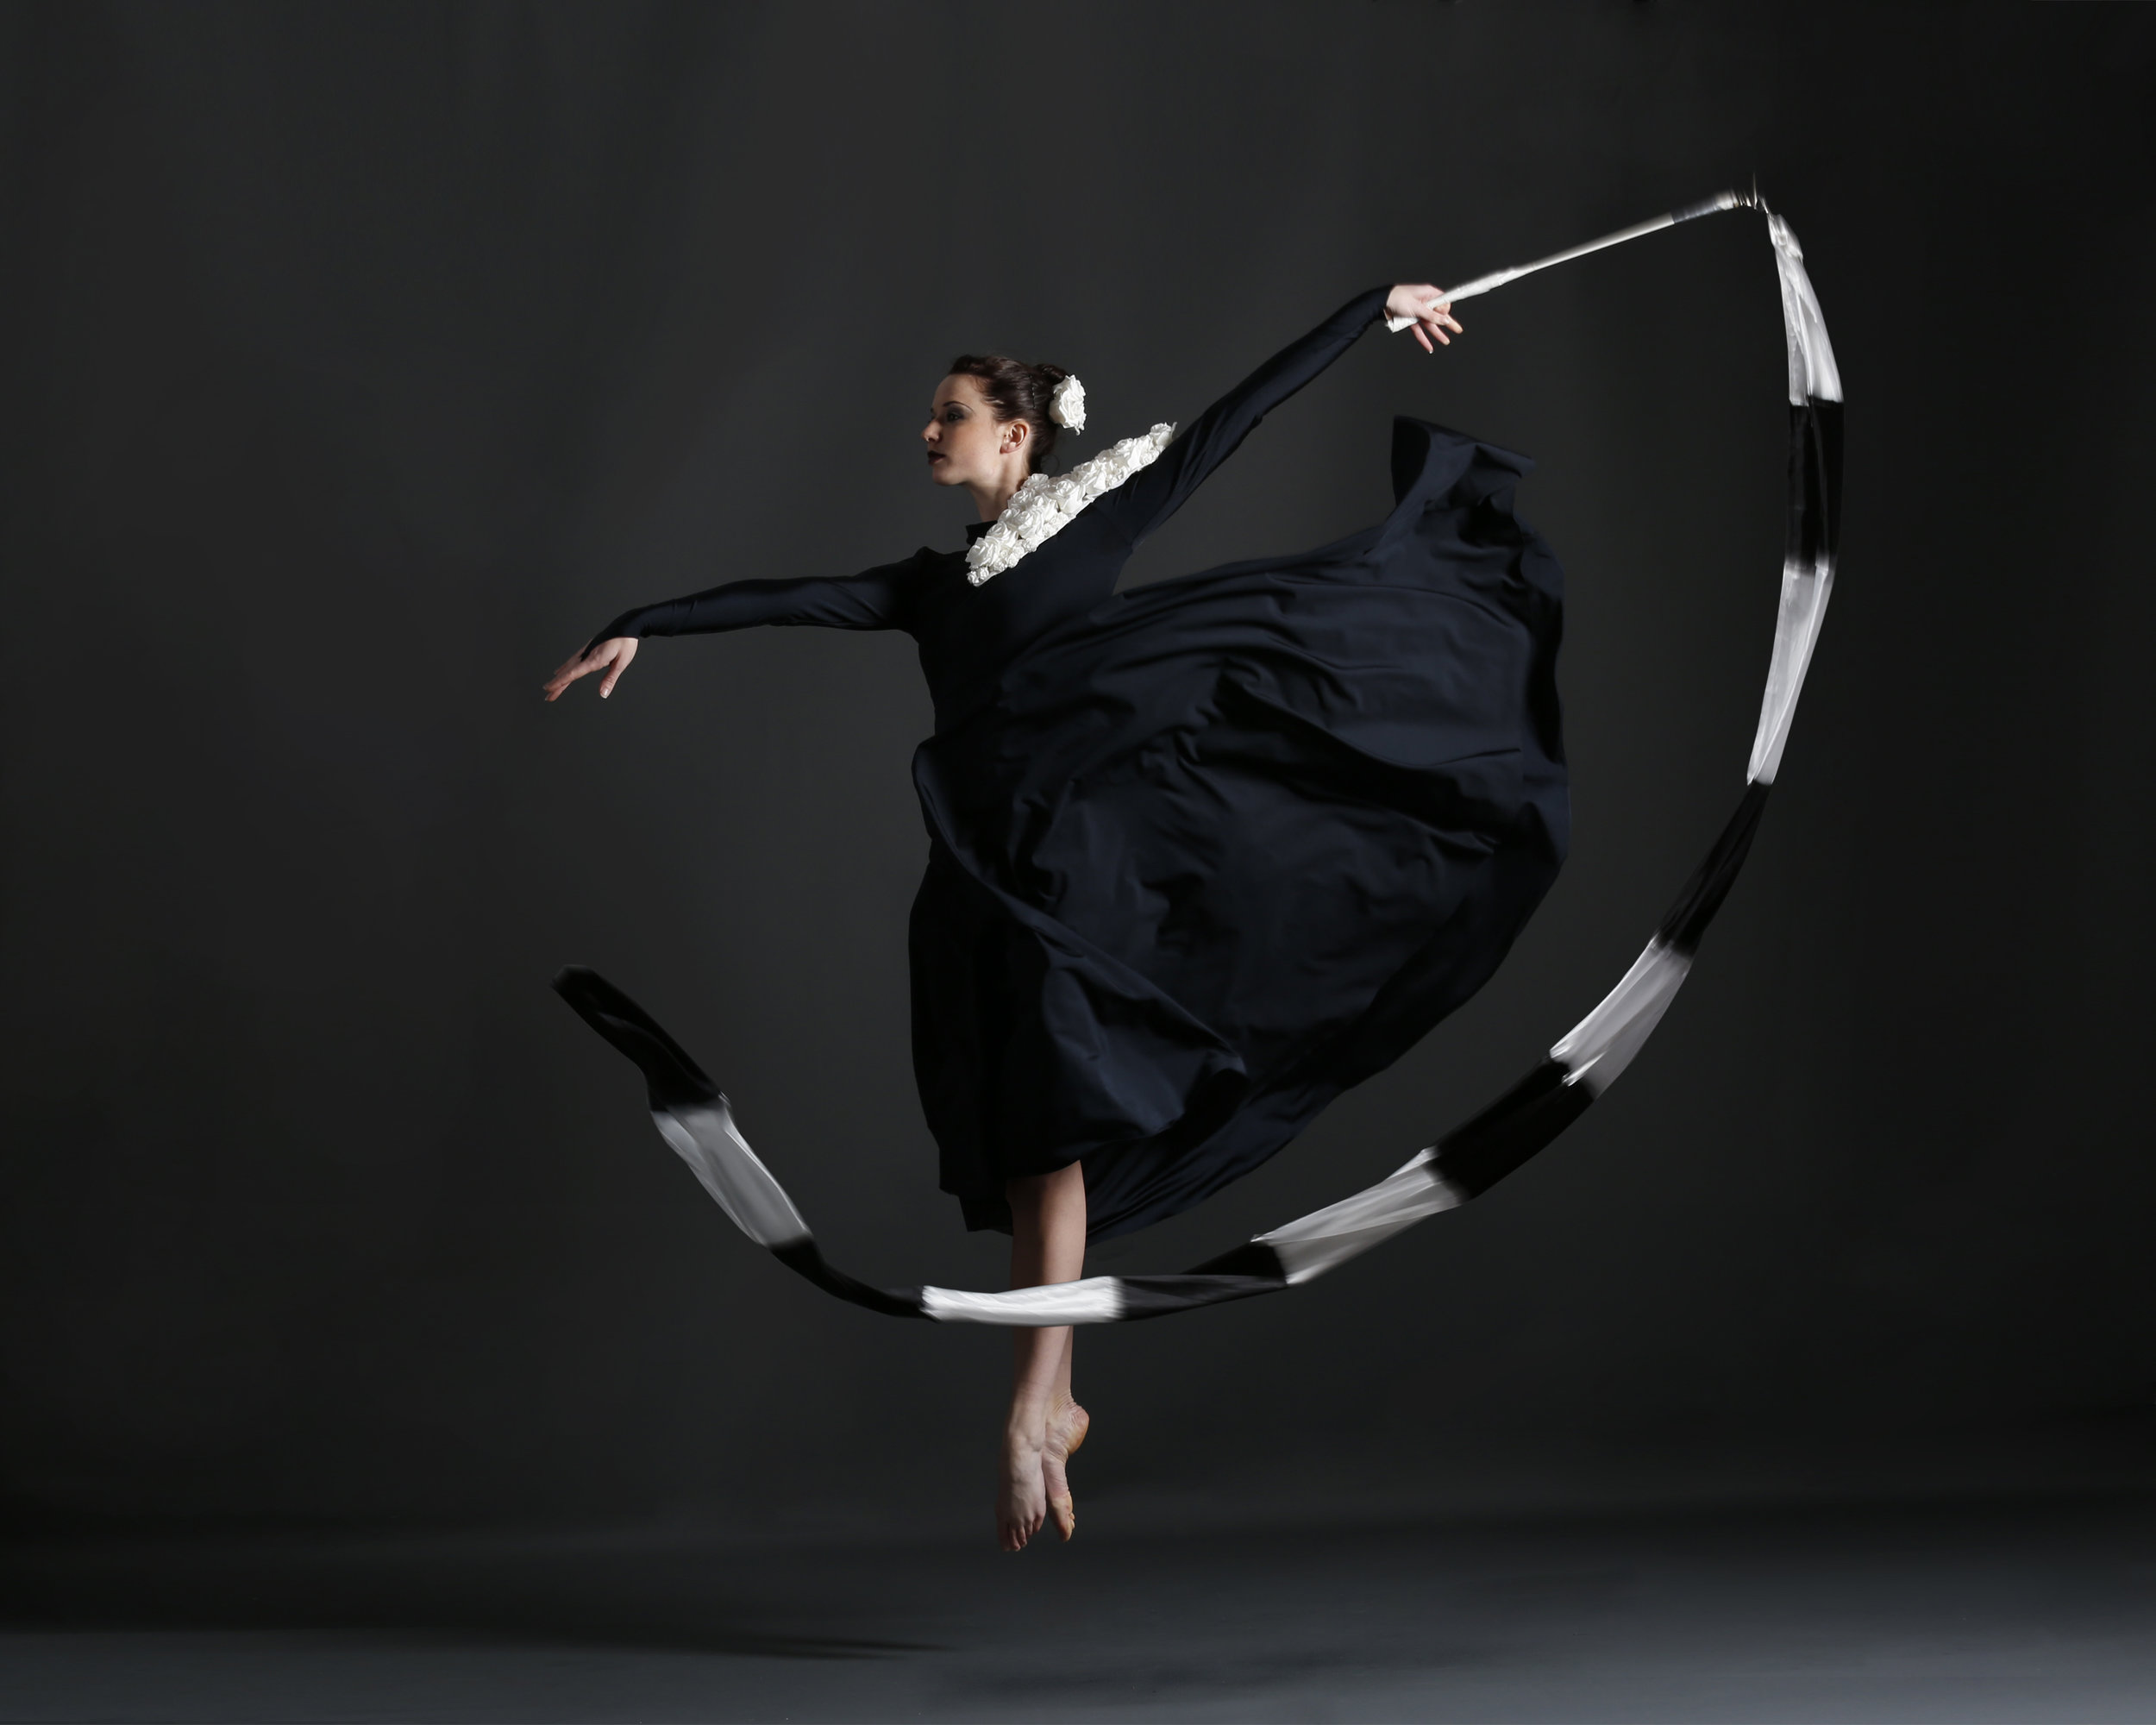 Light Emitting Dance in monochrome 2, Divine Company.jpg